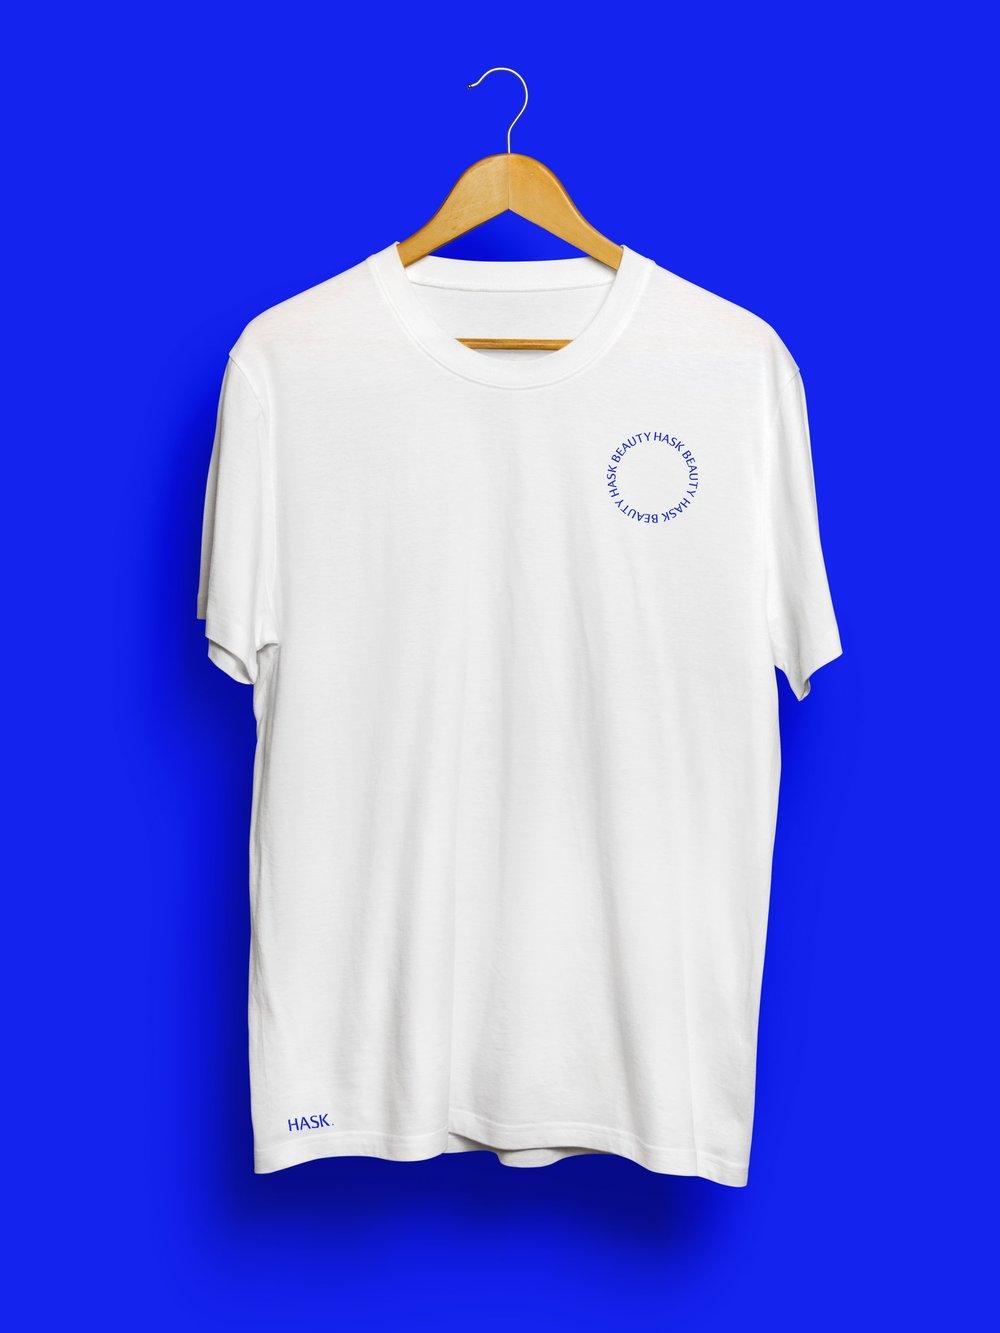 hask_t-shirt-004.jpg